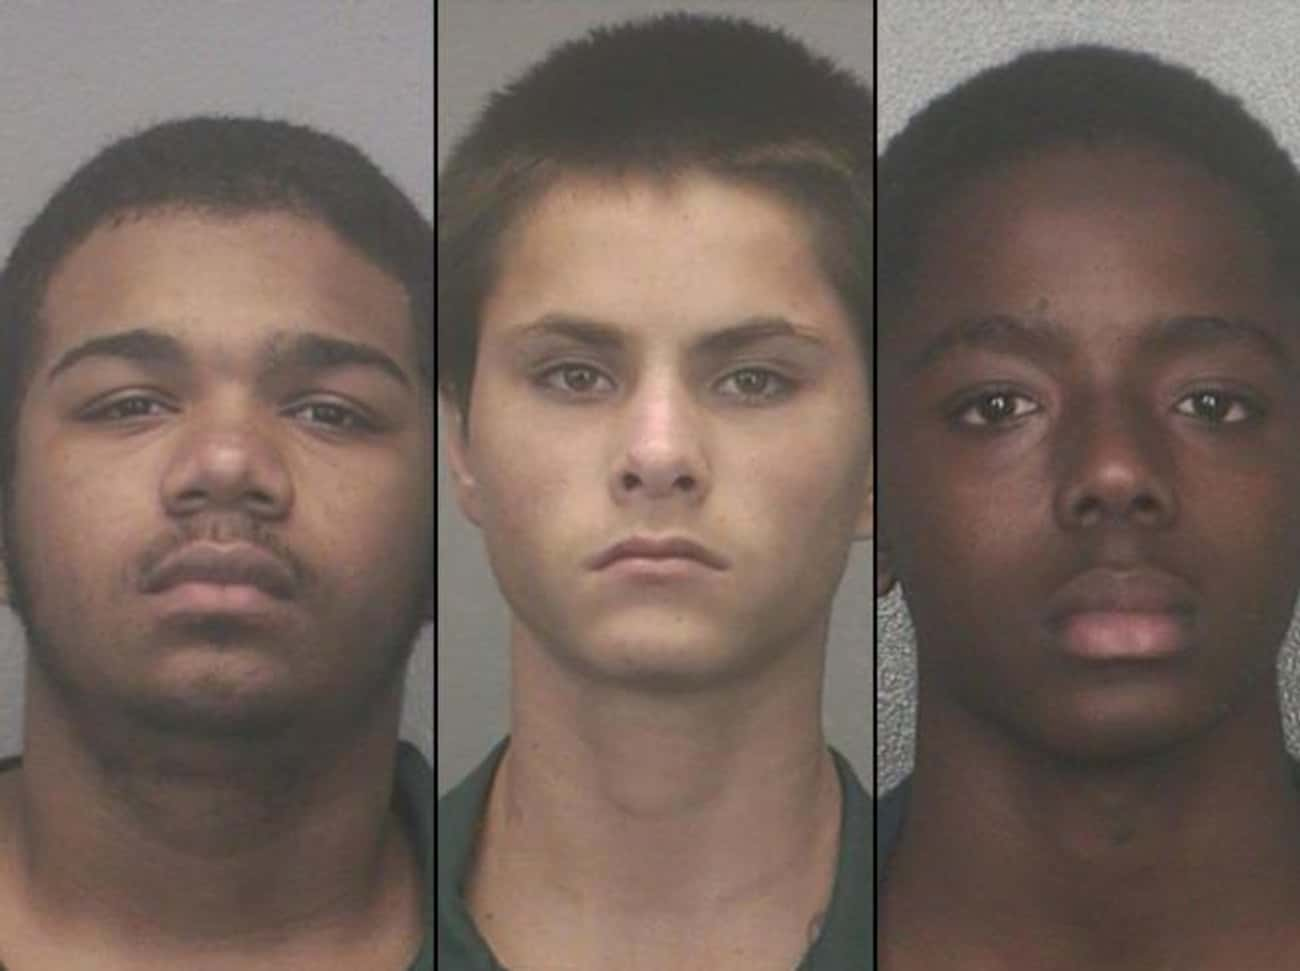 Denver Jarvis, Michael Bent, And Jesus Mendez Set Friend On Fire Over $40